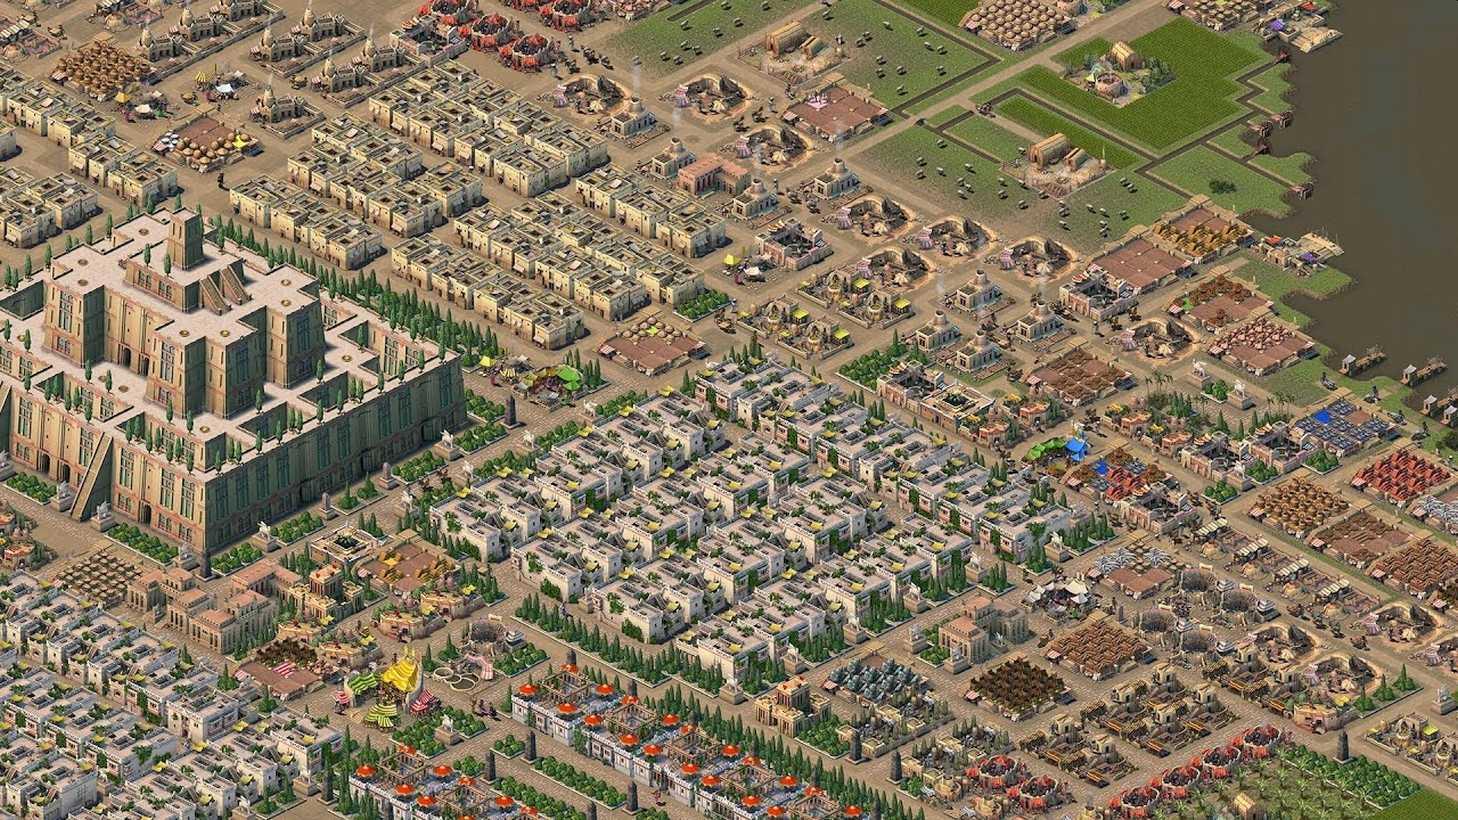 City Builder Simulator Nebuchadnezzar Launches On PC This February